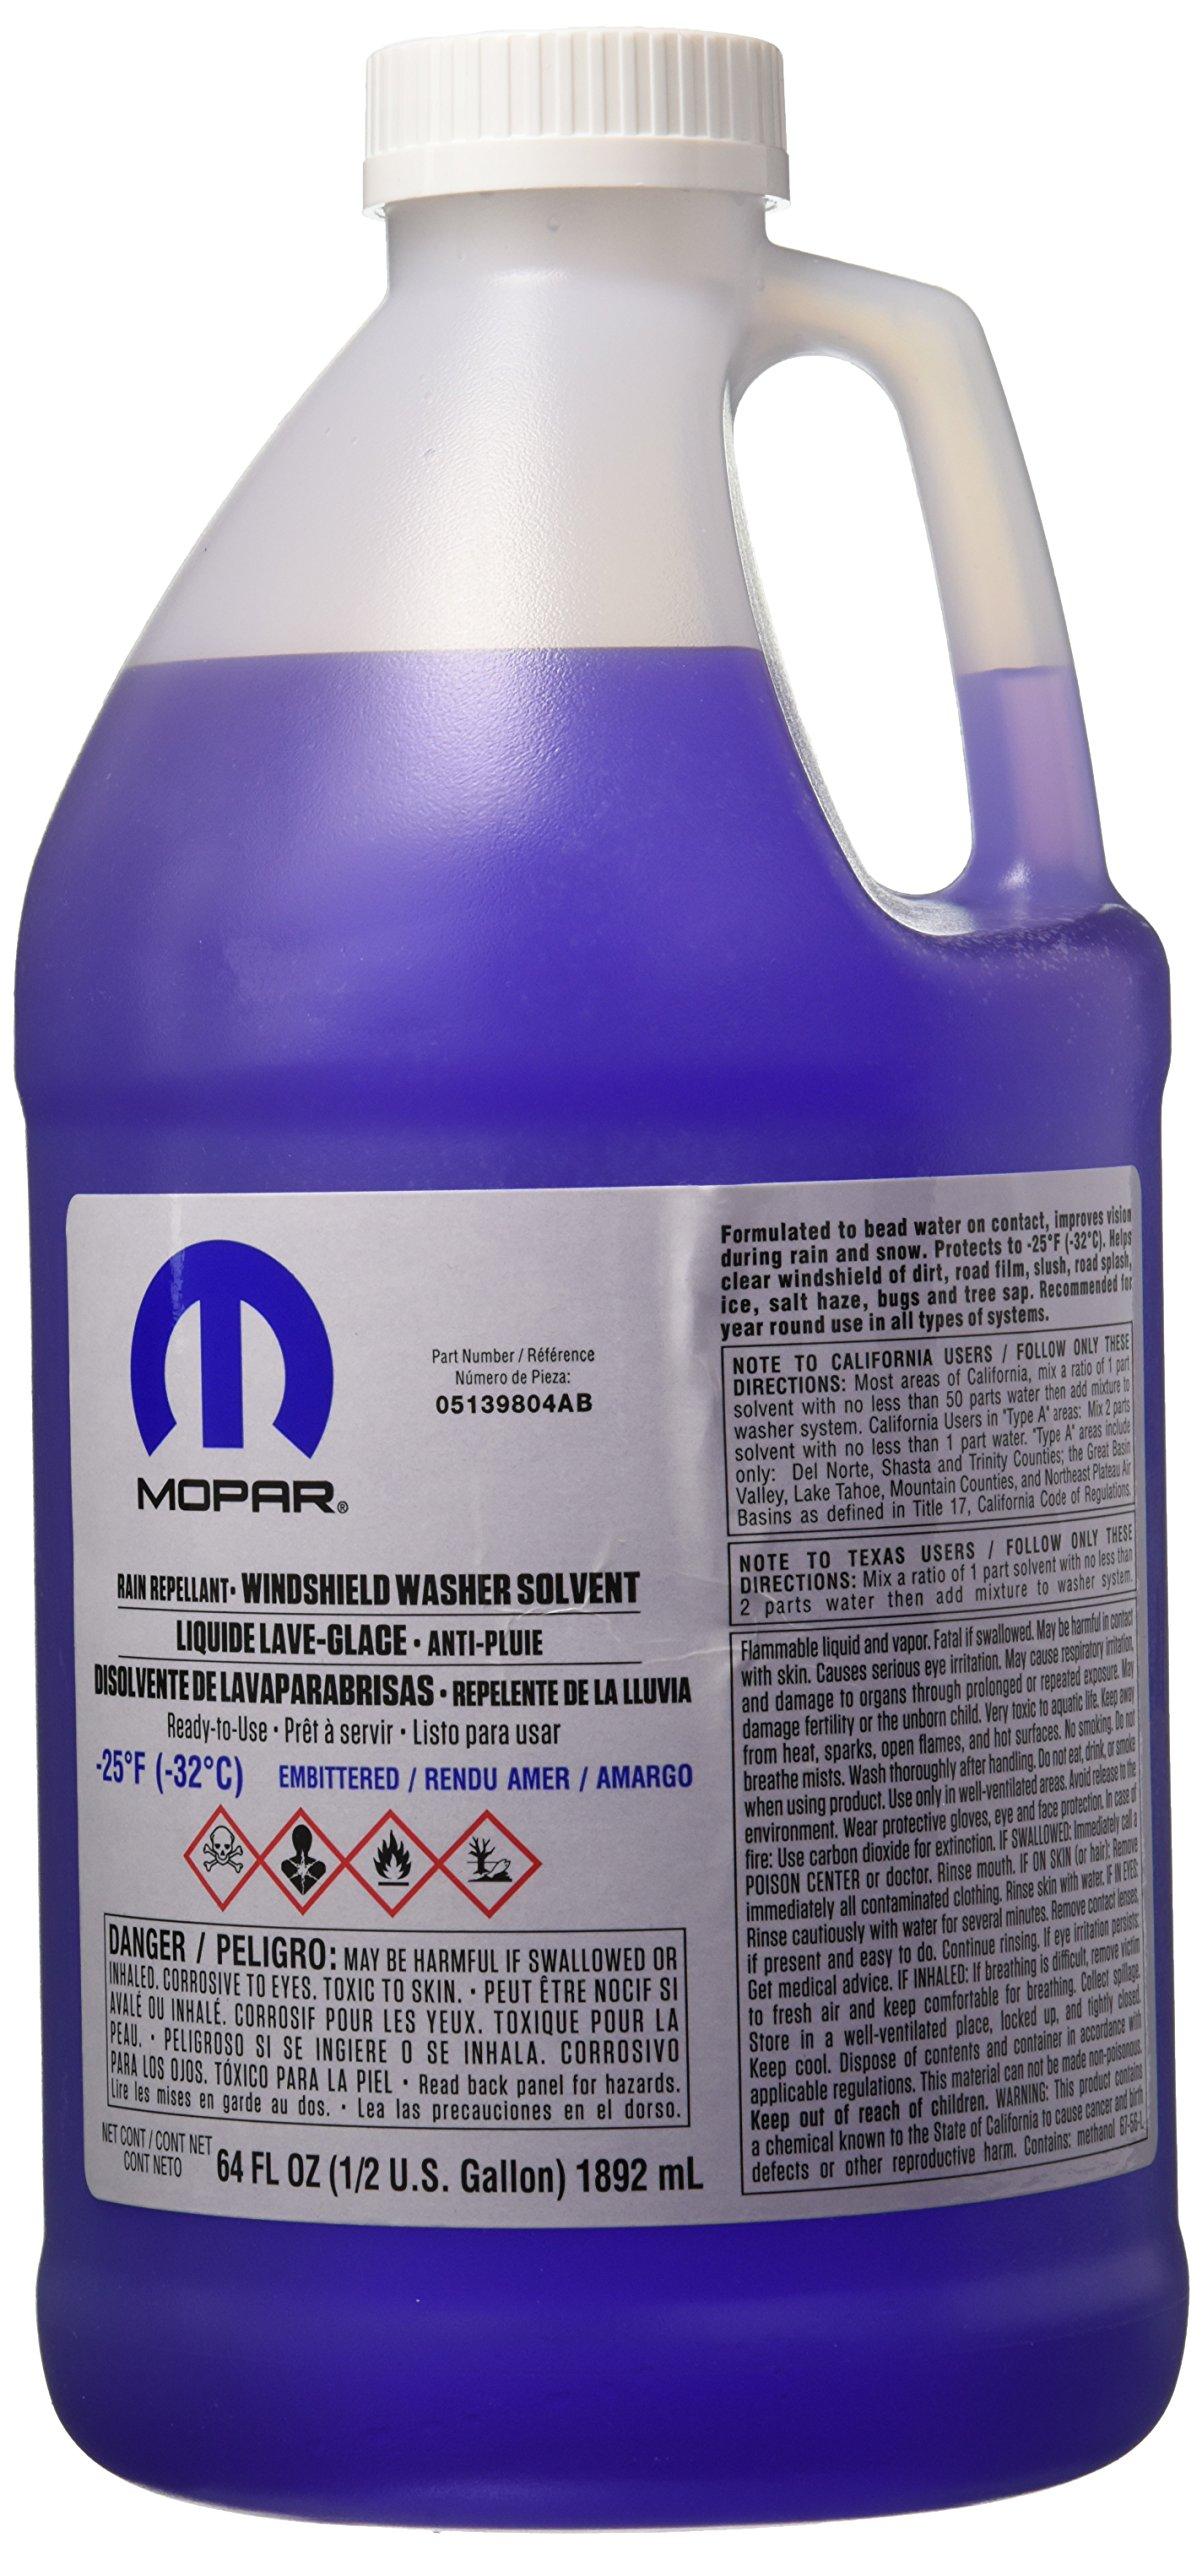 Genuine Chrysler Accessories 5139804AB Rain Repellant Windshield Washer Fluid - 64 oz. Bottle